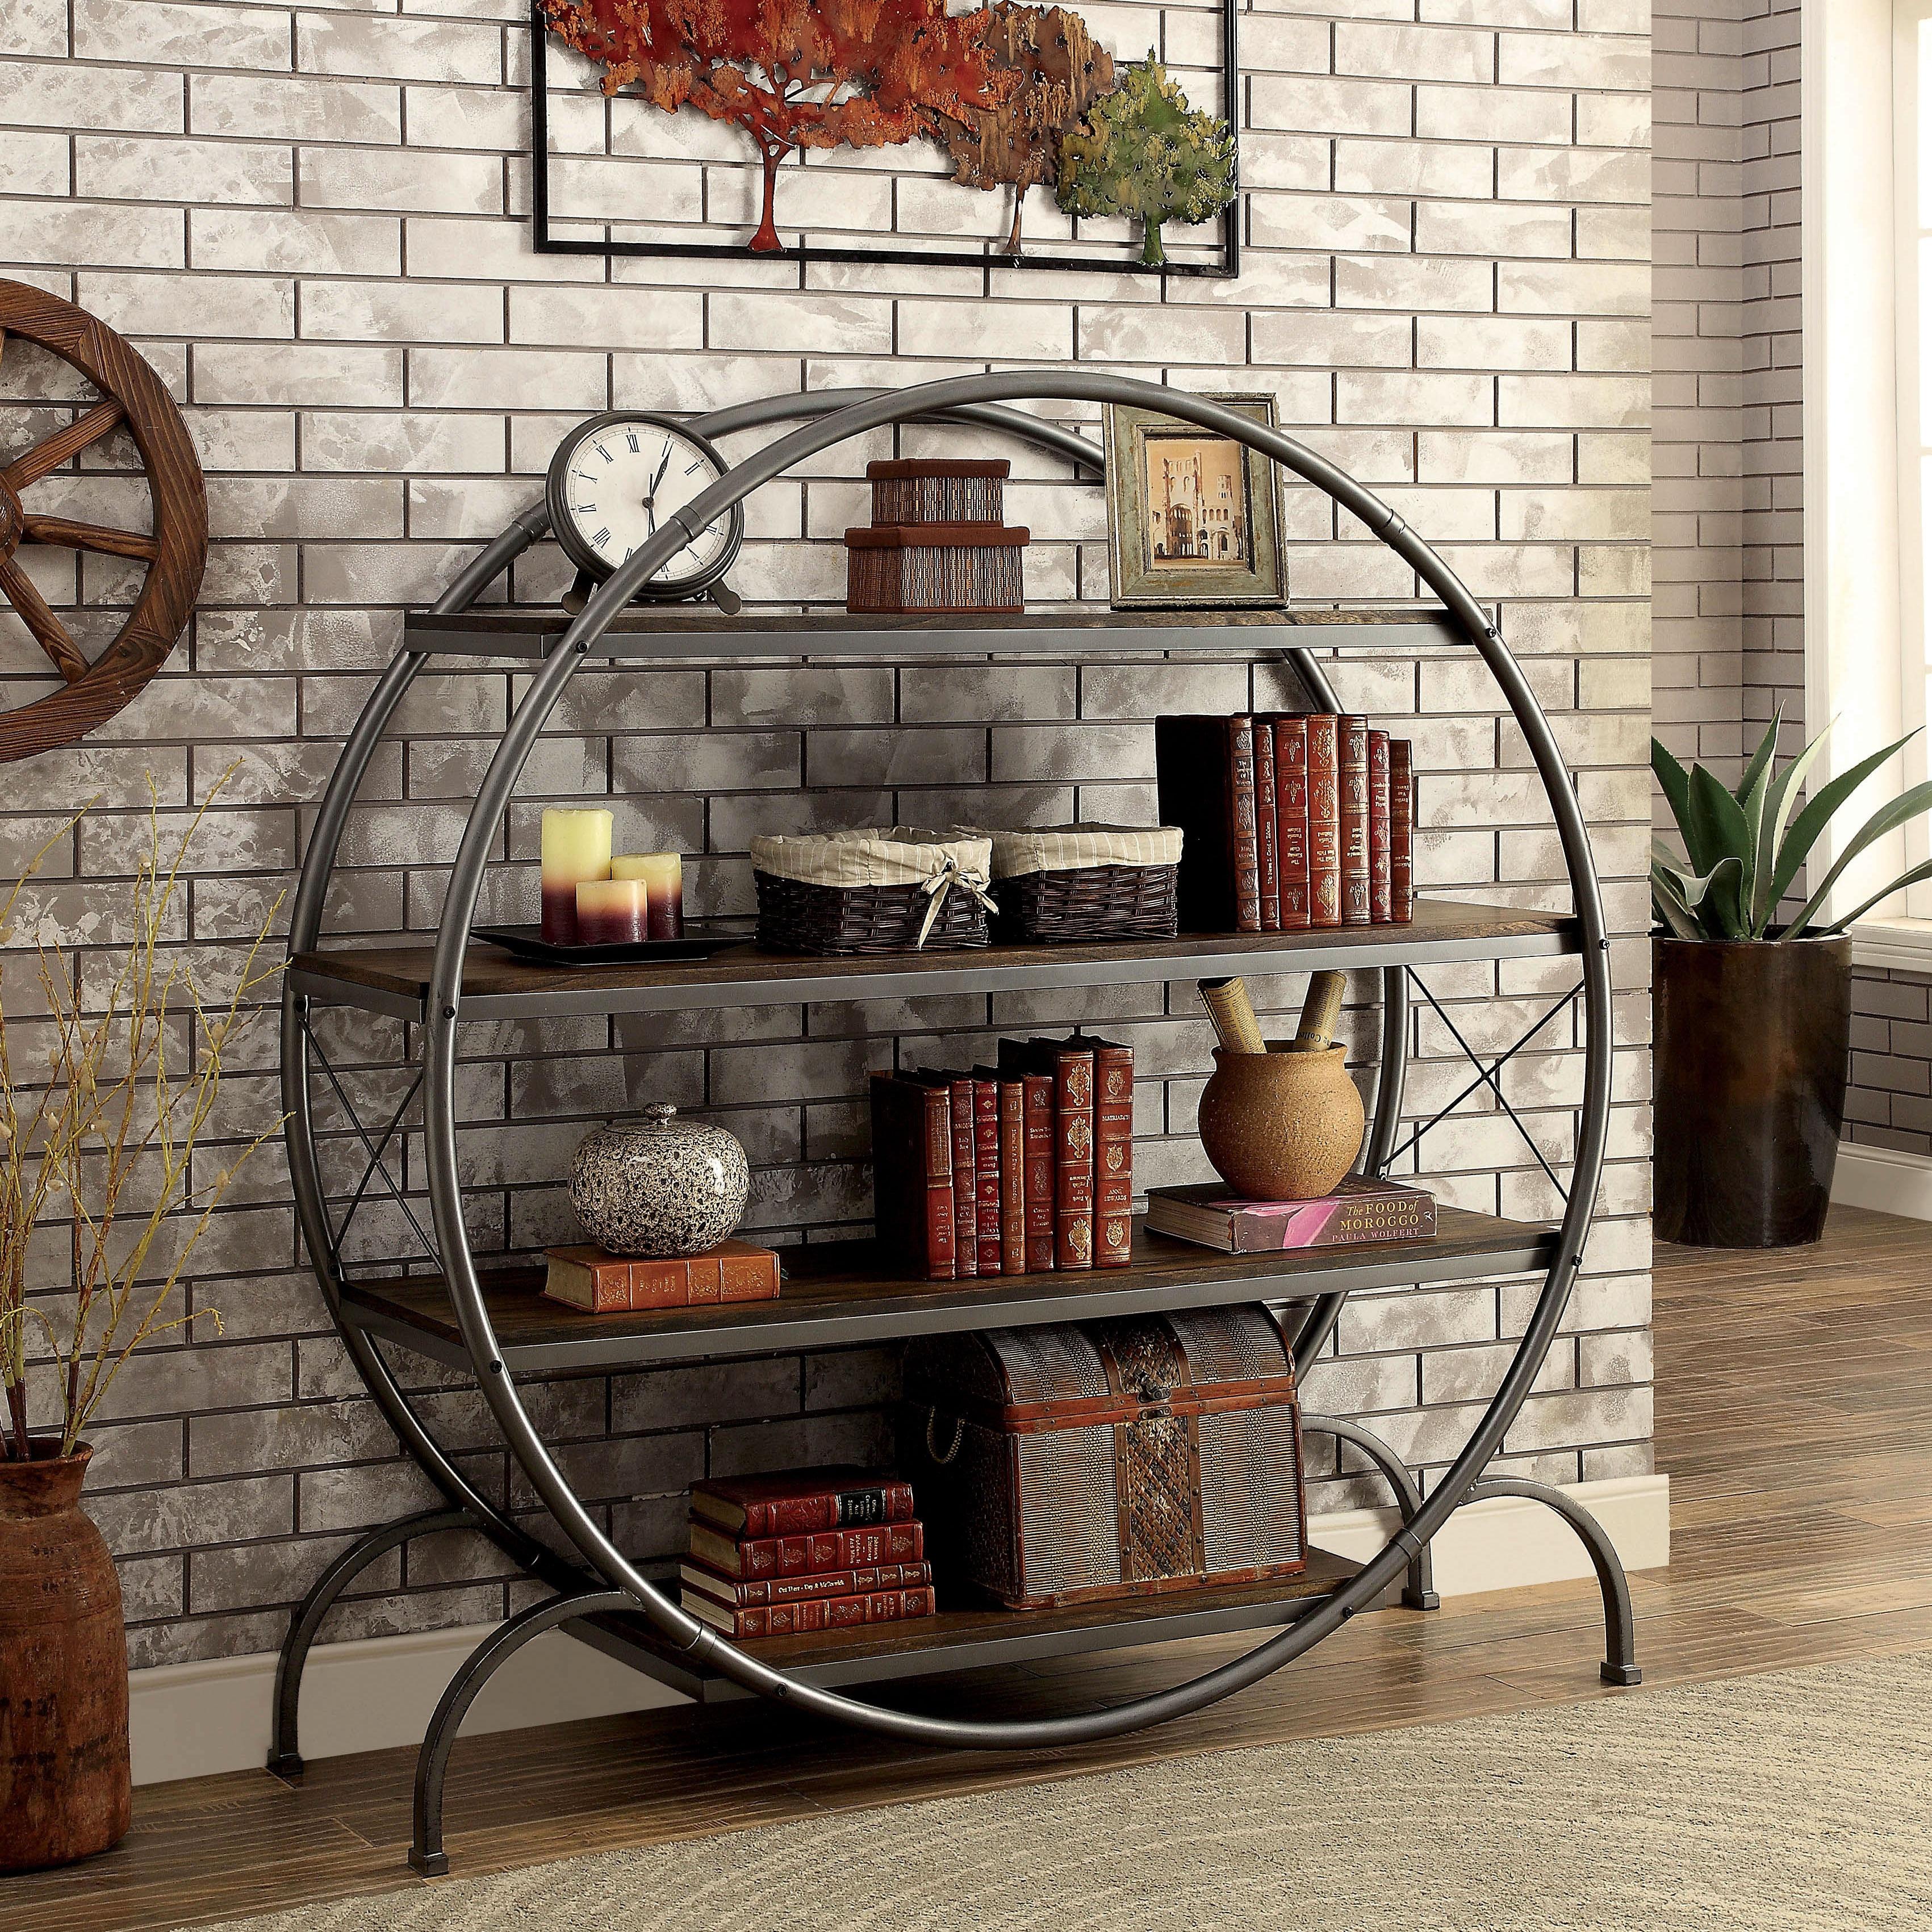 Furniture Of America Diovani Industrial Metal Dark Grey/Black Circular  4 Shelf Bookshelf   Free Shipping Today   Overstock.com   21758206